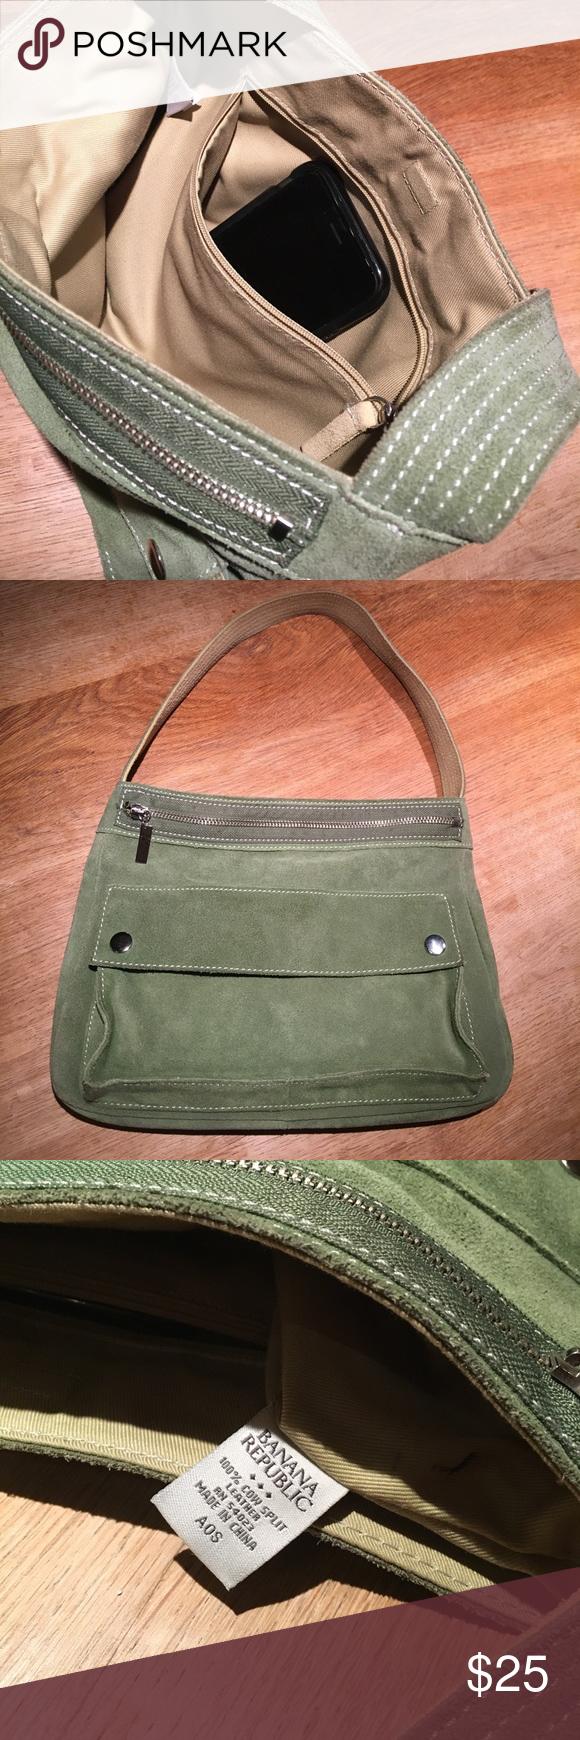 Banana republic handbag- 100% leather Pale green Banana Republic Bags  Shoulder Bags 870dd42917